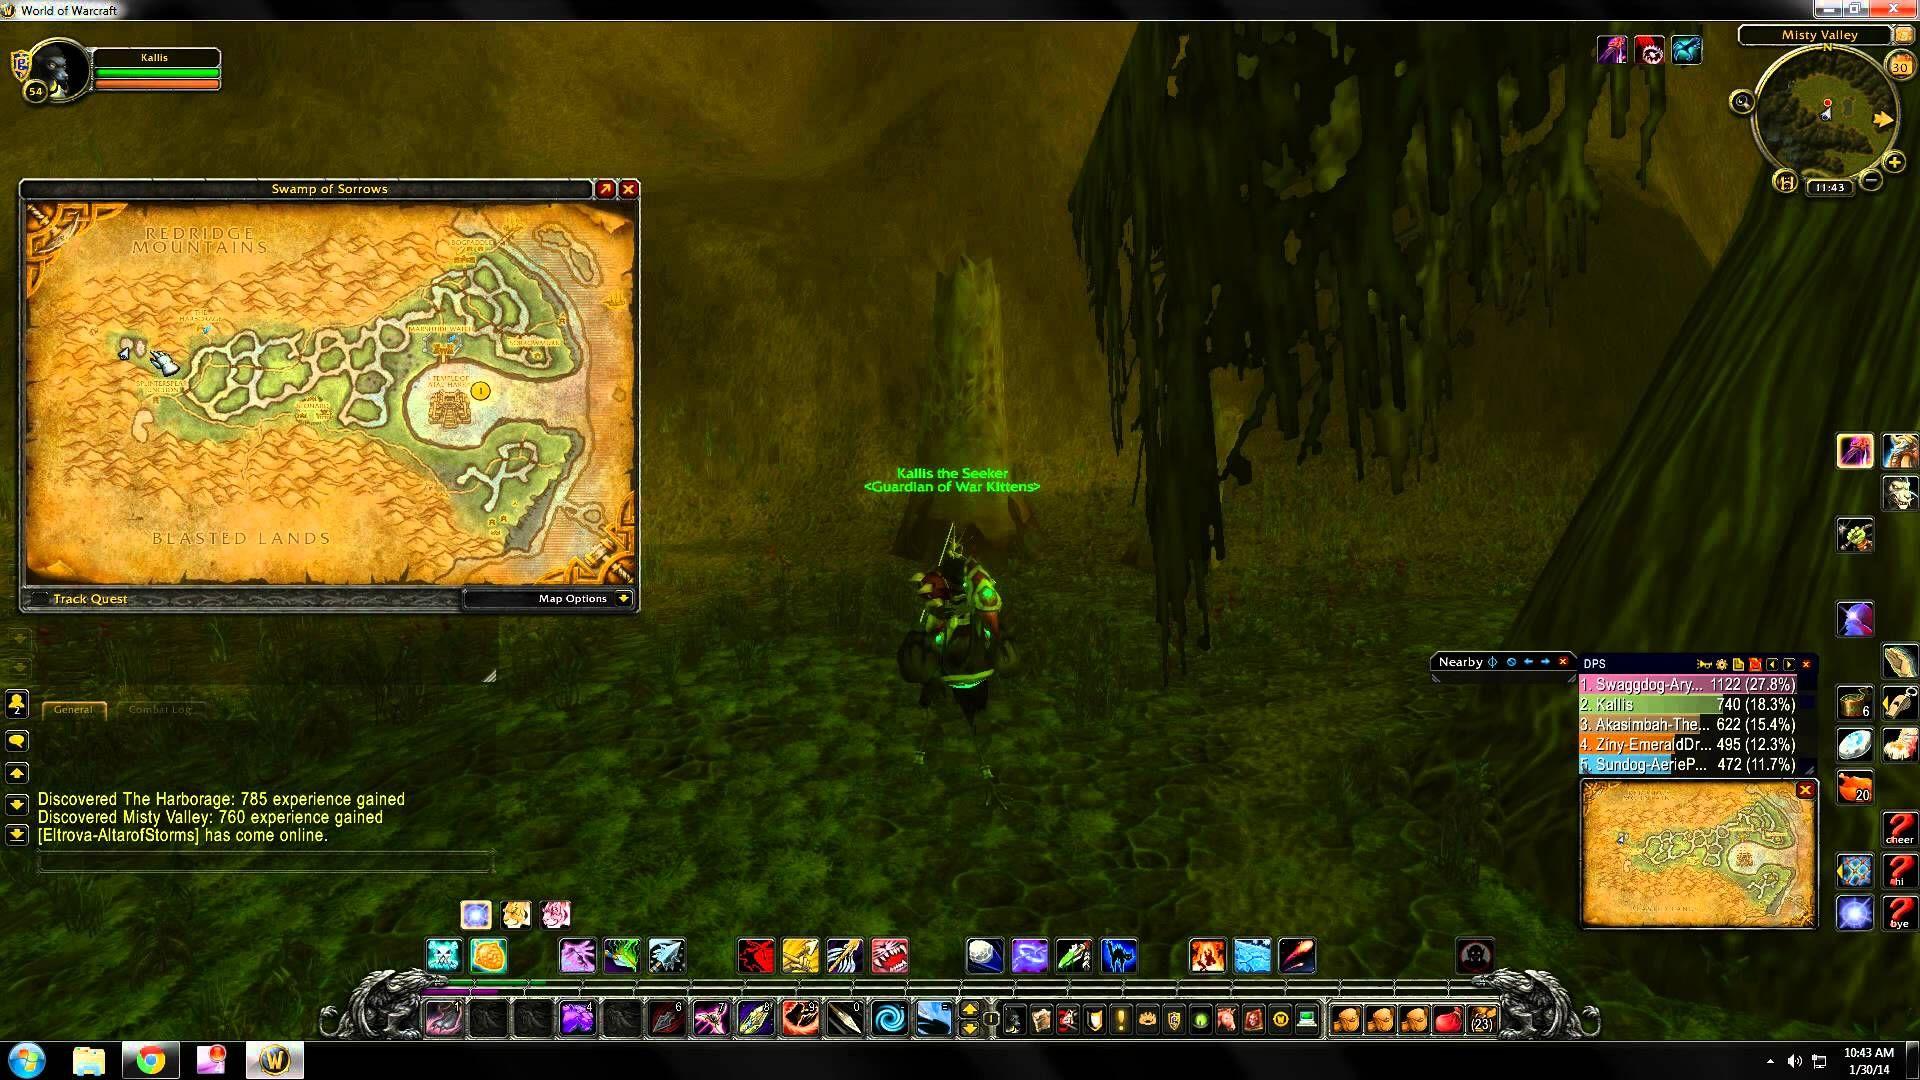 World of Warcraft rare hunter pet locations Swamp of